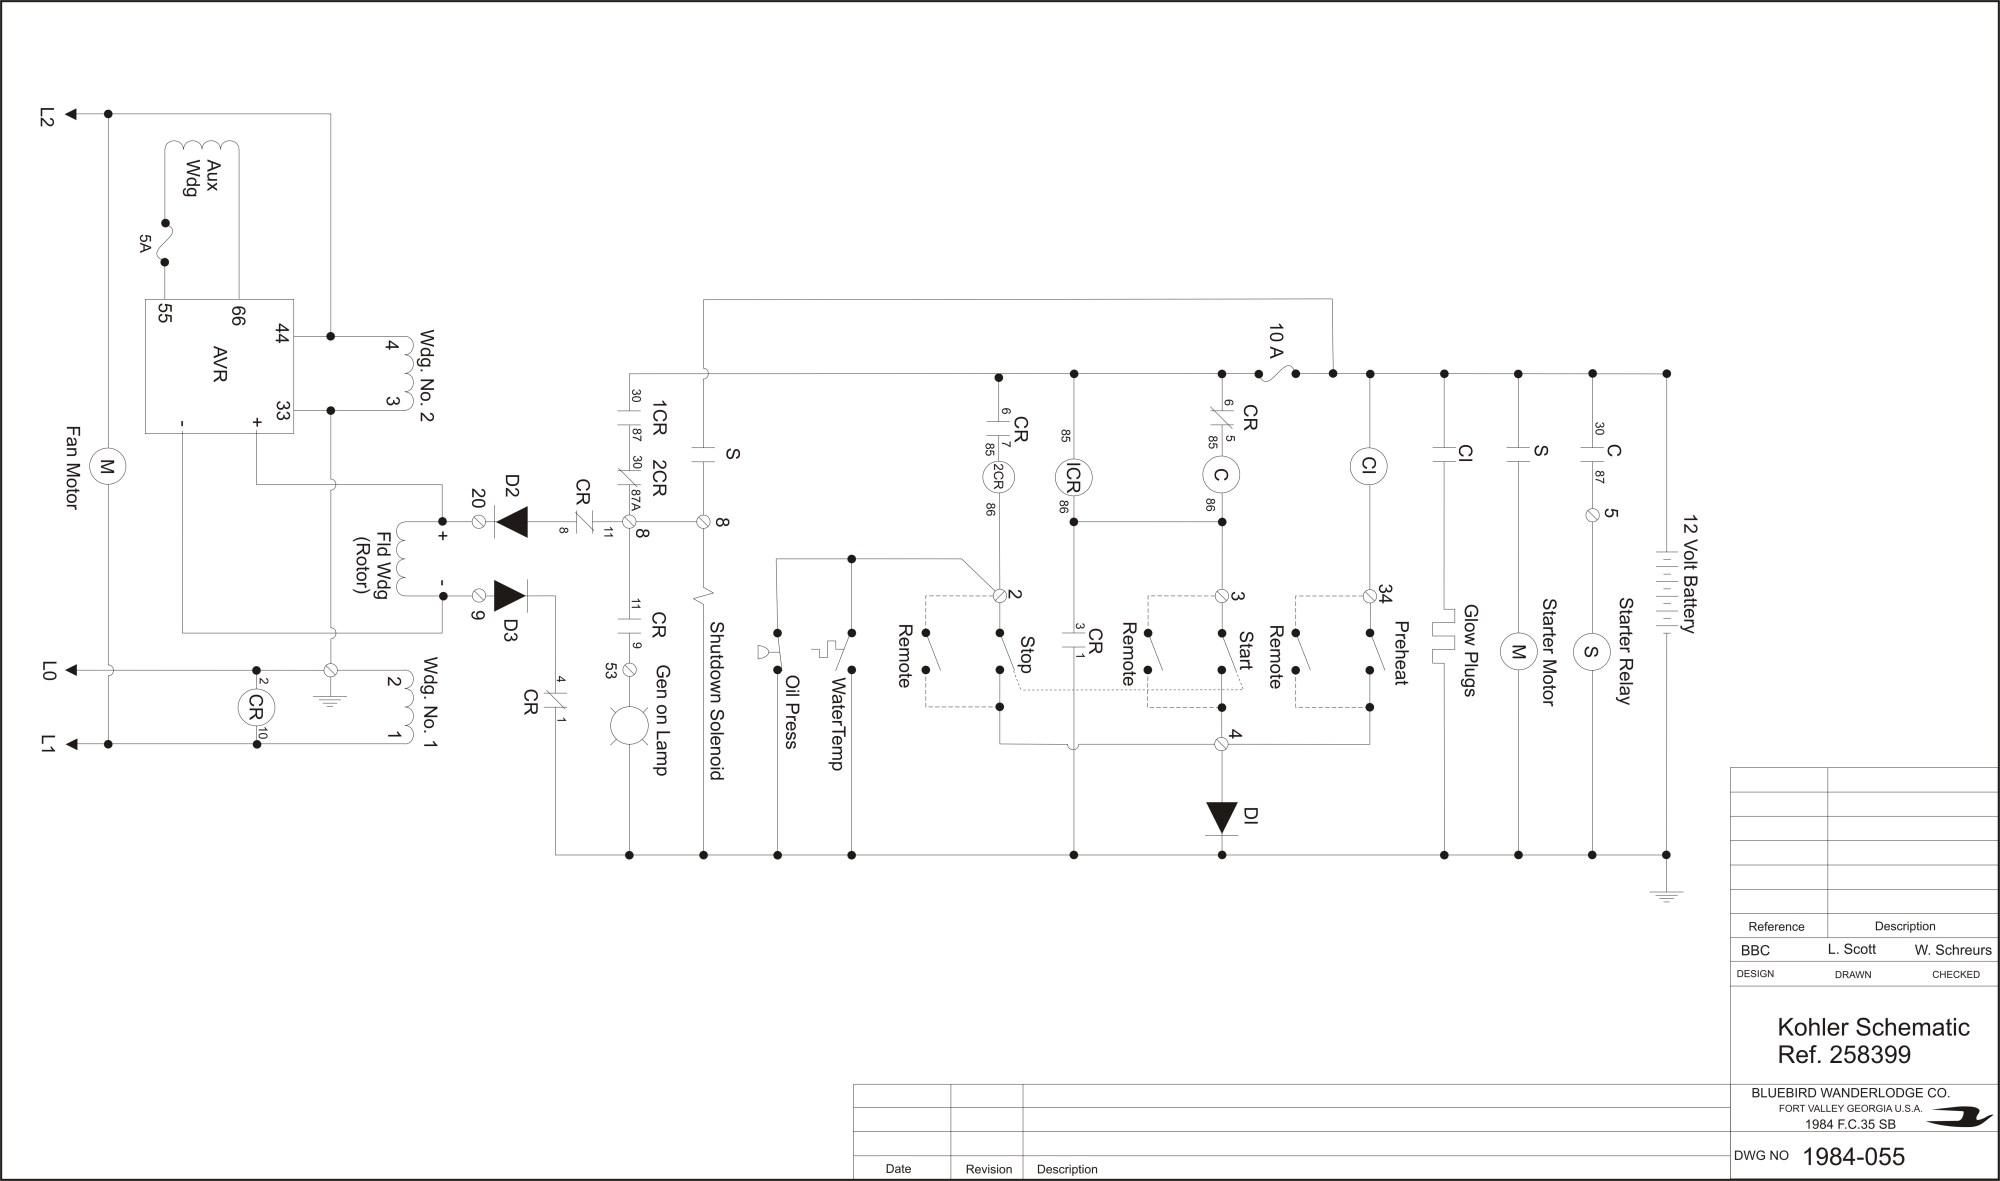 hight resolution of 2195021 1990 wb battchargeckt pdf 887327 1991 charging circuit redrawn jpg dir 1991 1994 diagrams 2195021 1991 wb battchargeckt pdf